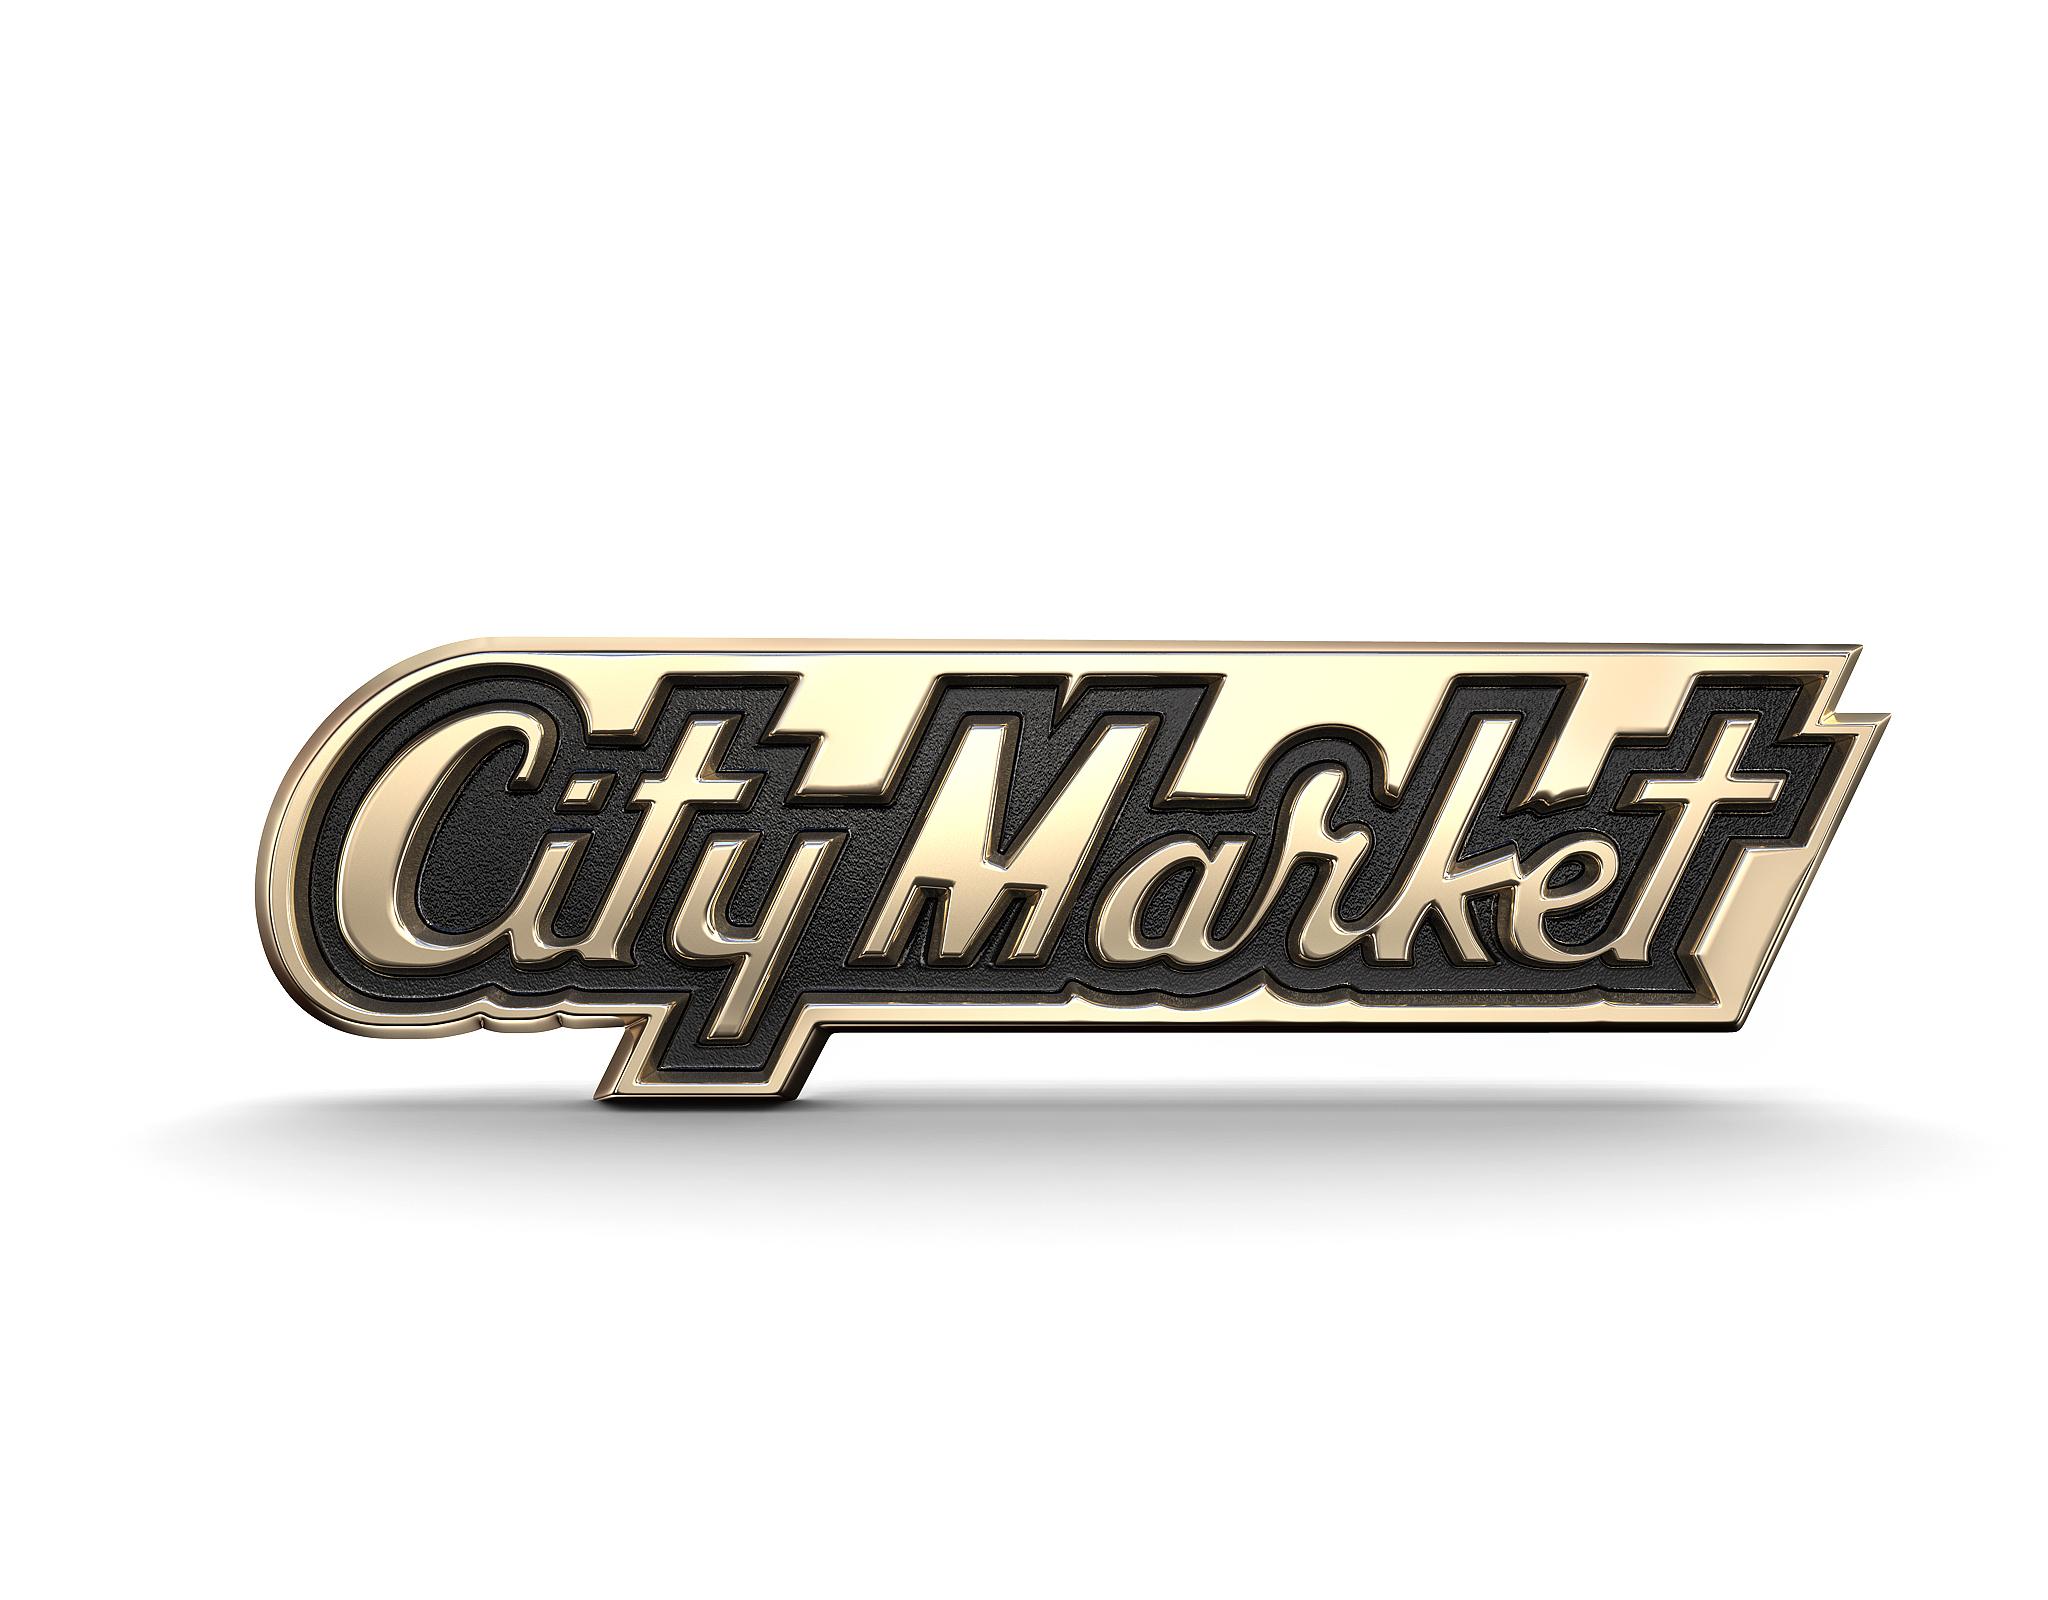 CityMarket.jpg